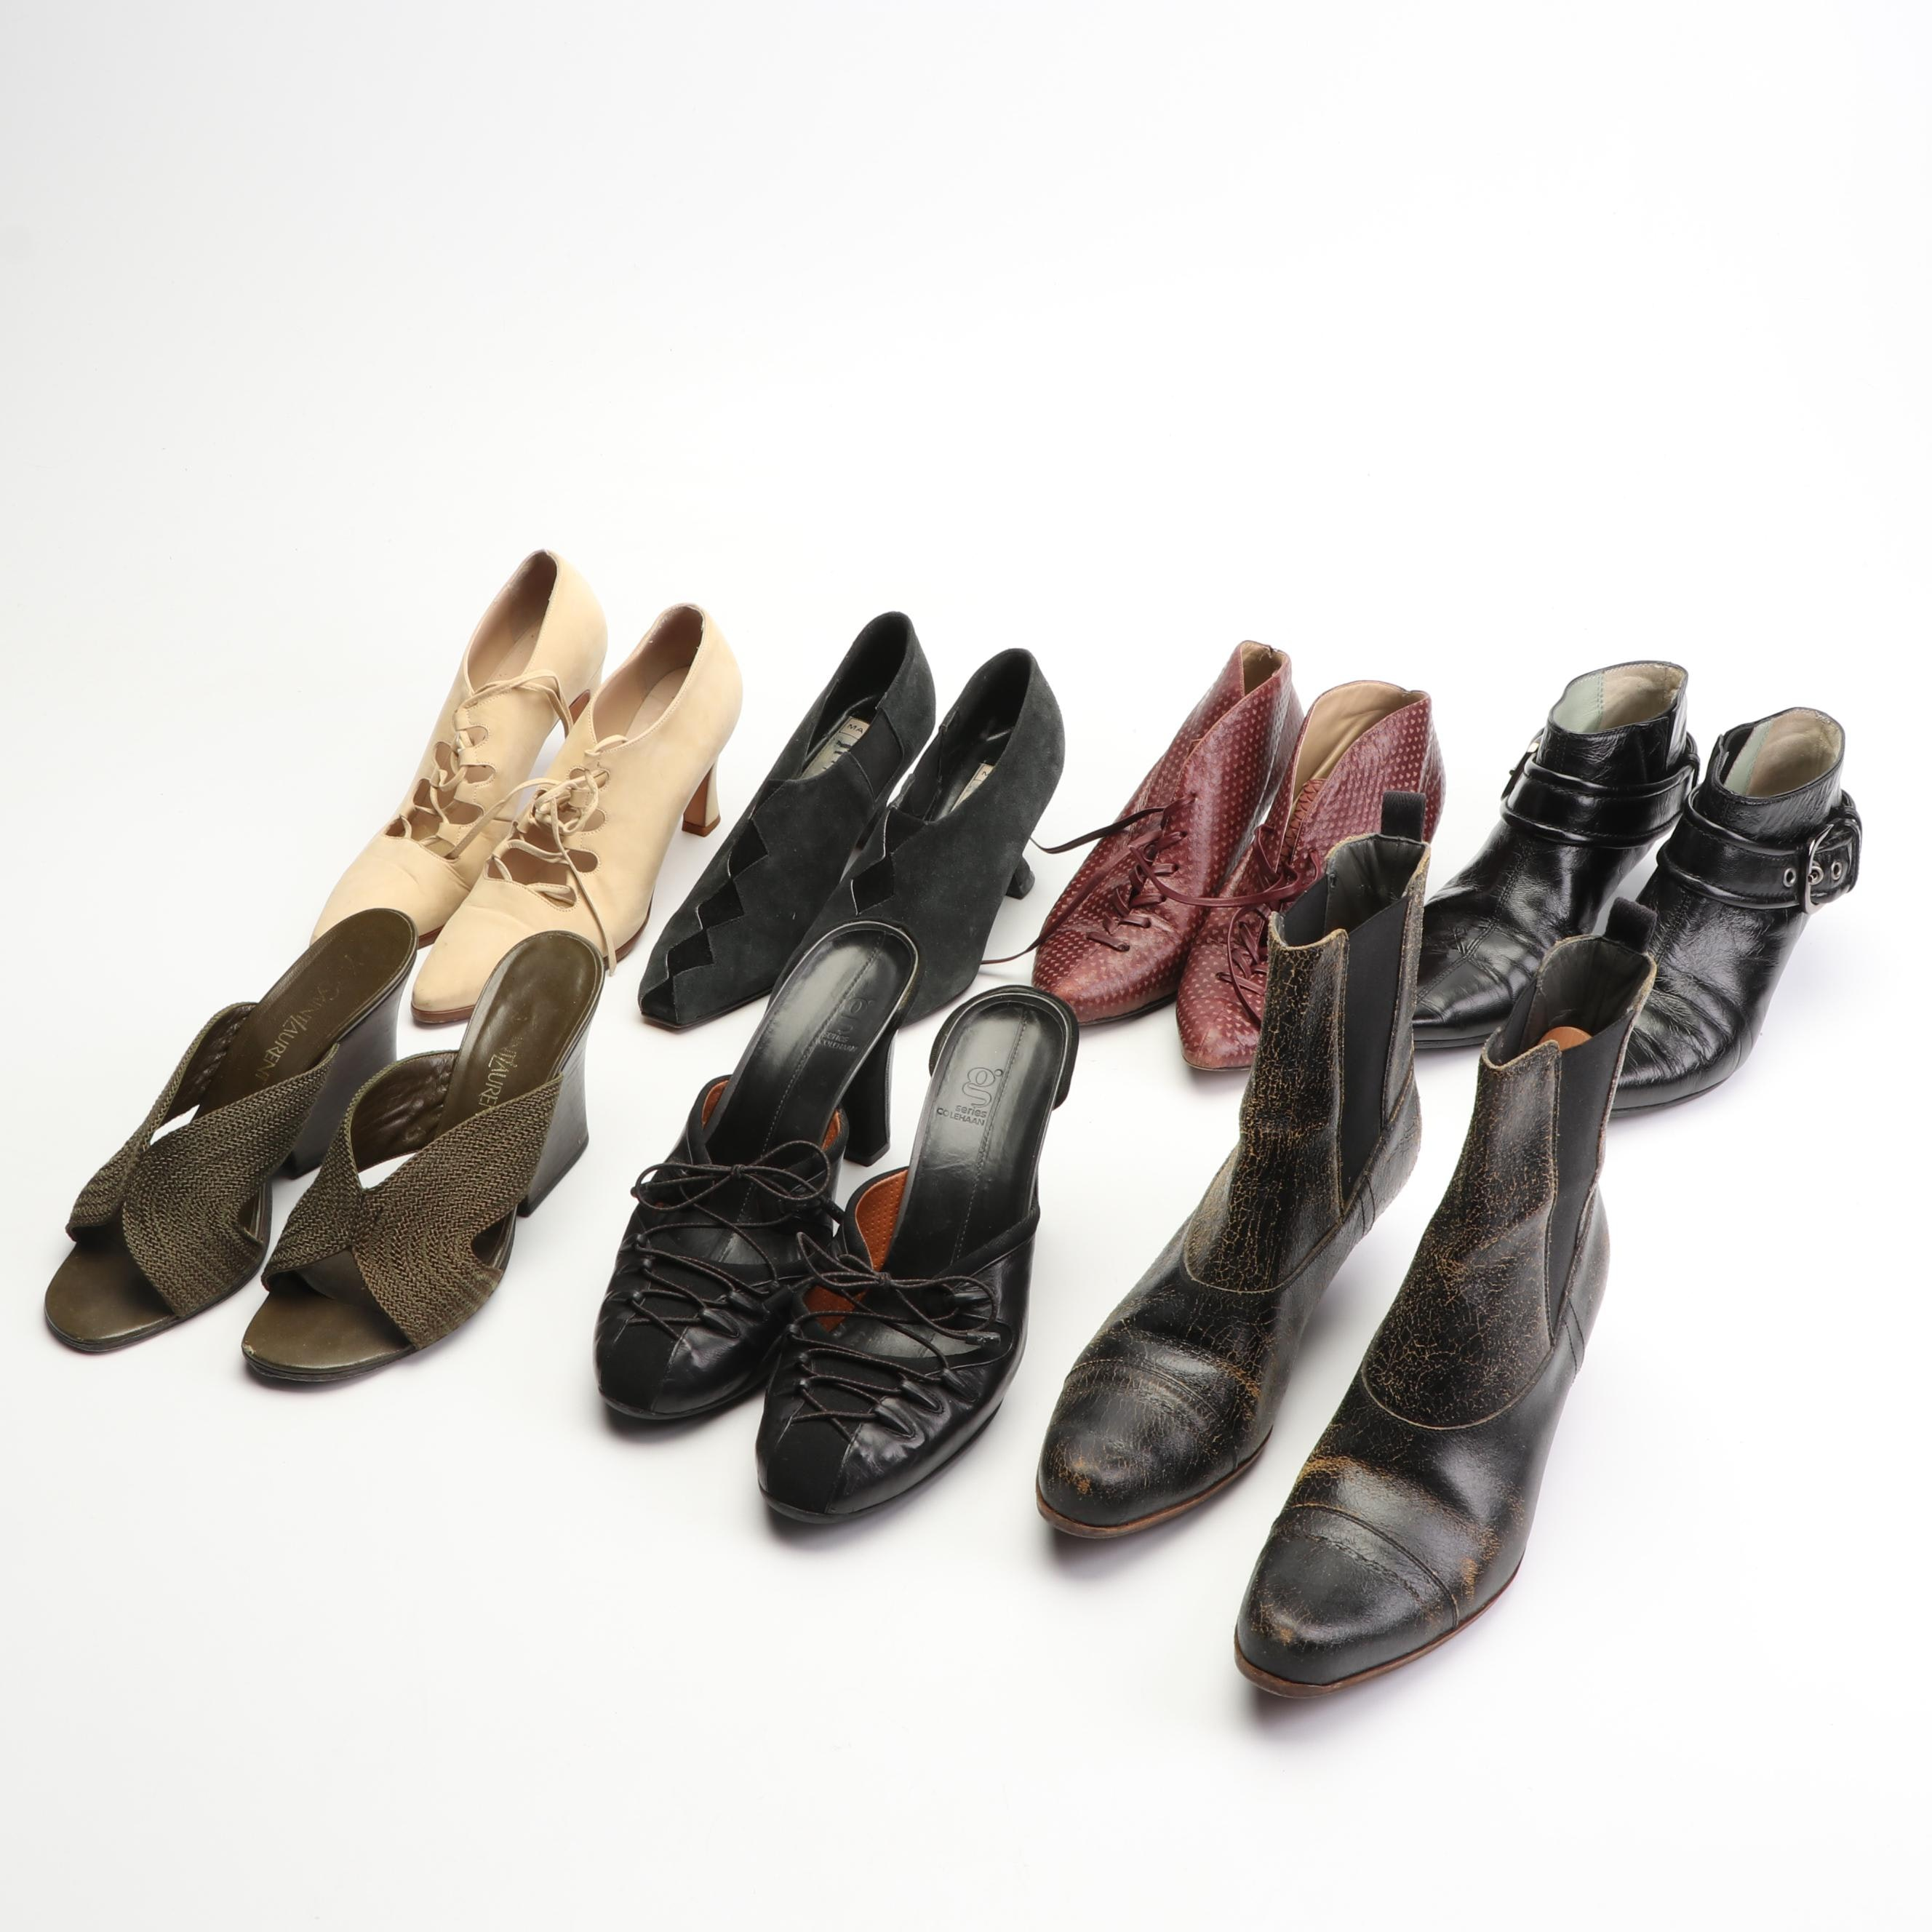 Women's Contemporary Heels Featuring Yves Saint Laurent and Miu Miu